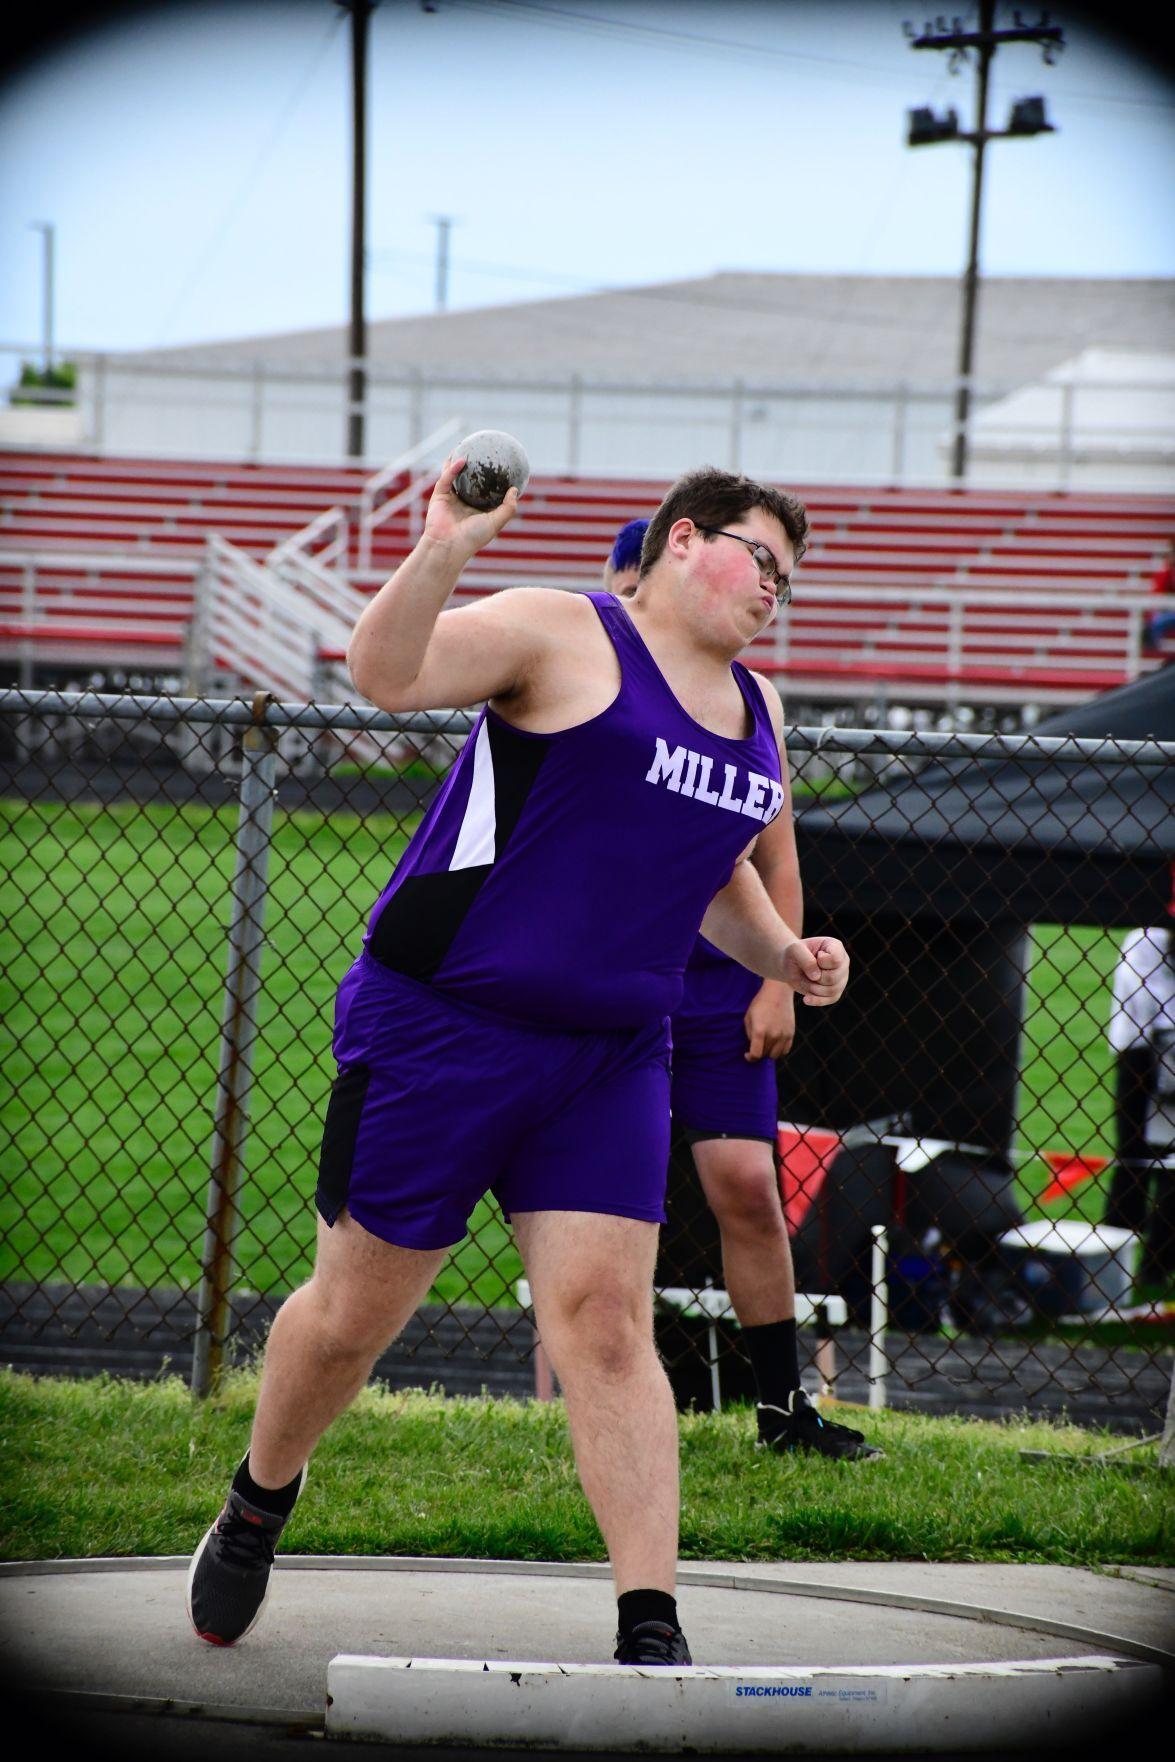 Landon Paige throw